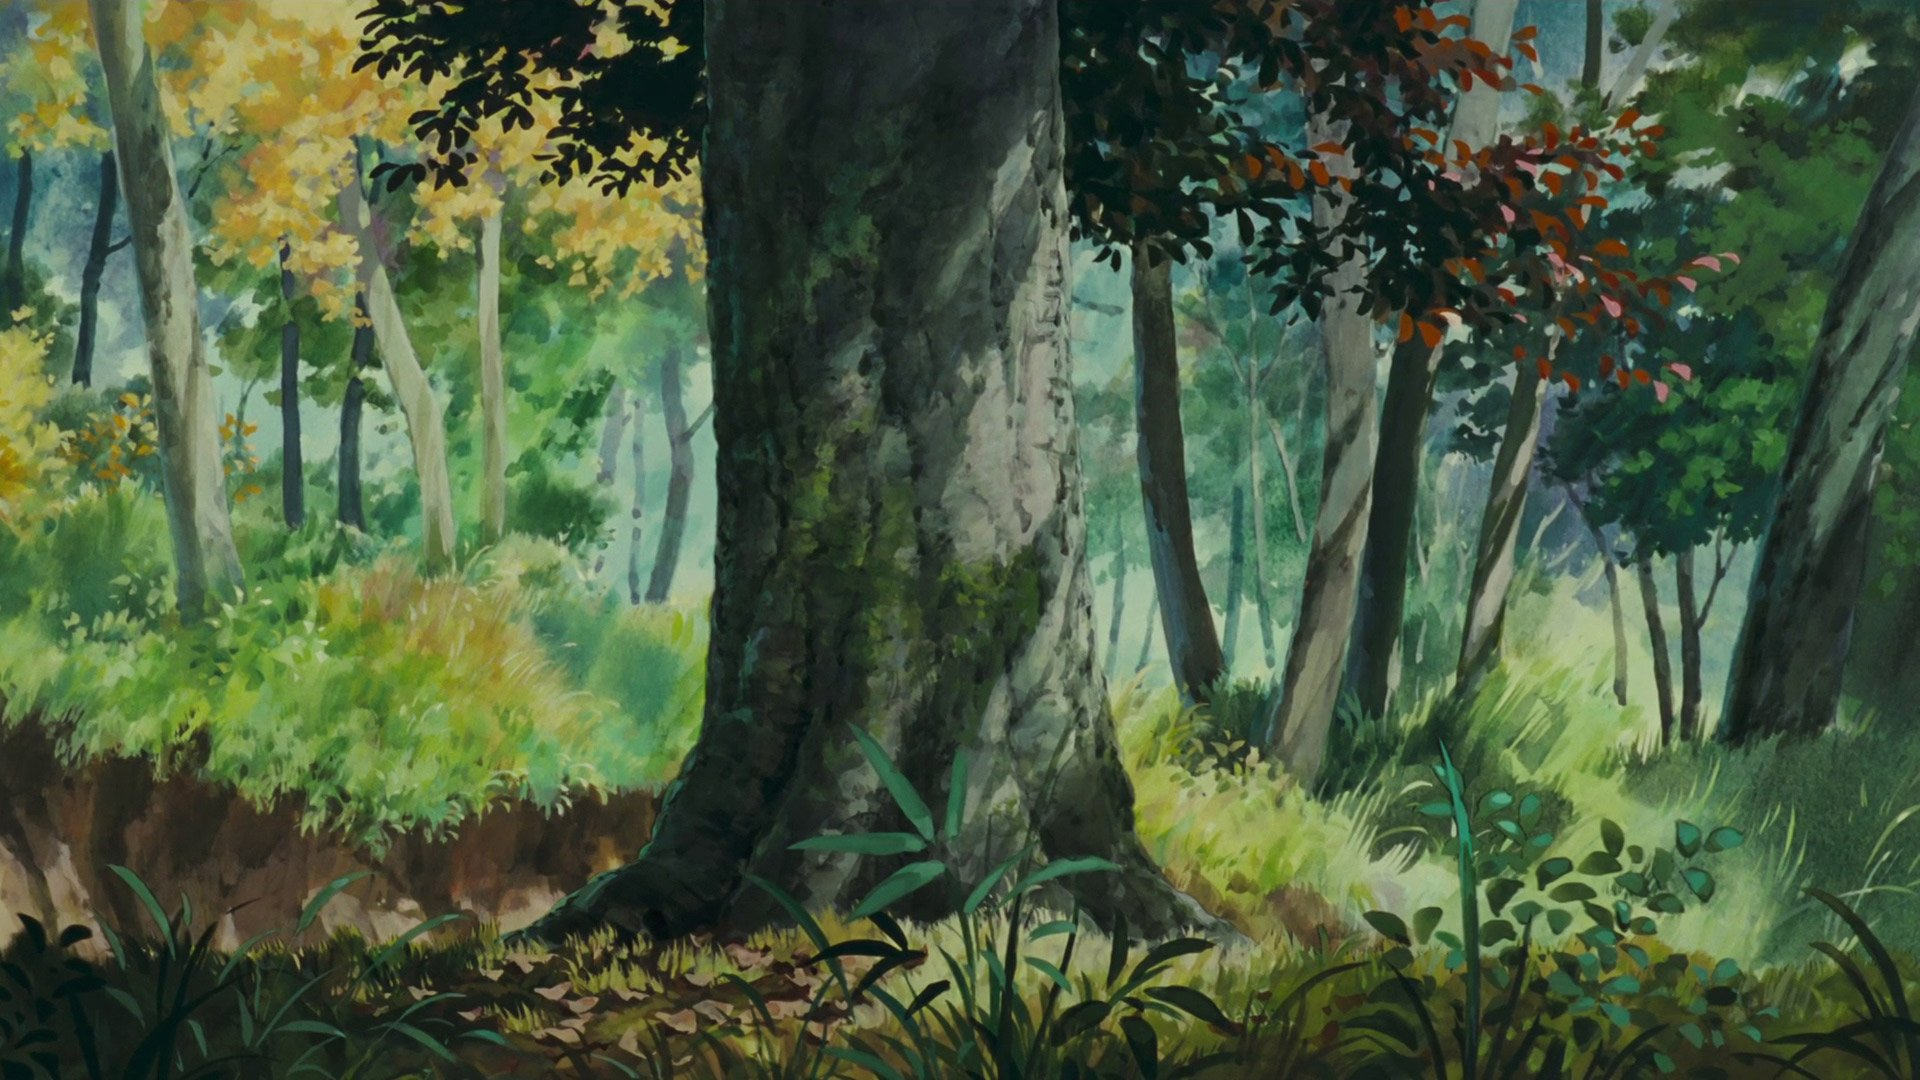 Pom Poko painted nature wallpaper